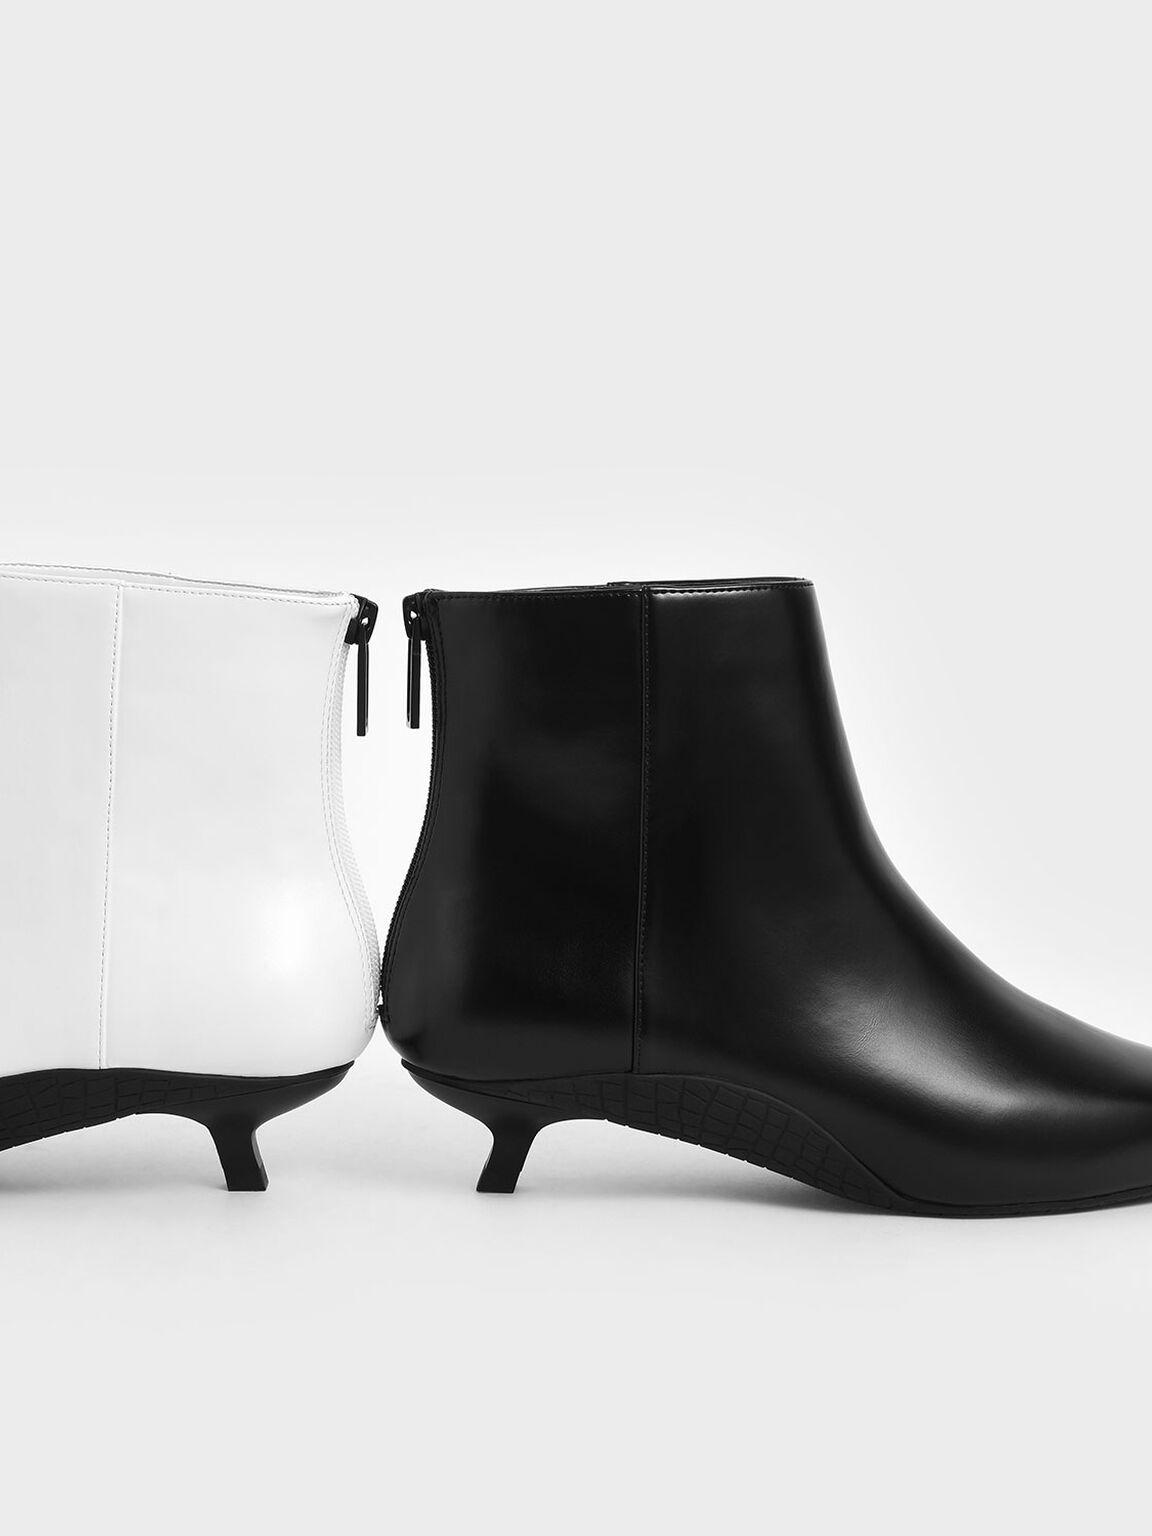 Kitten Heel Ankle Boots, Black, hi-res